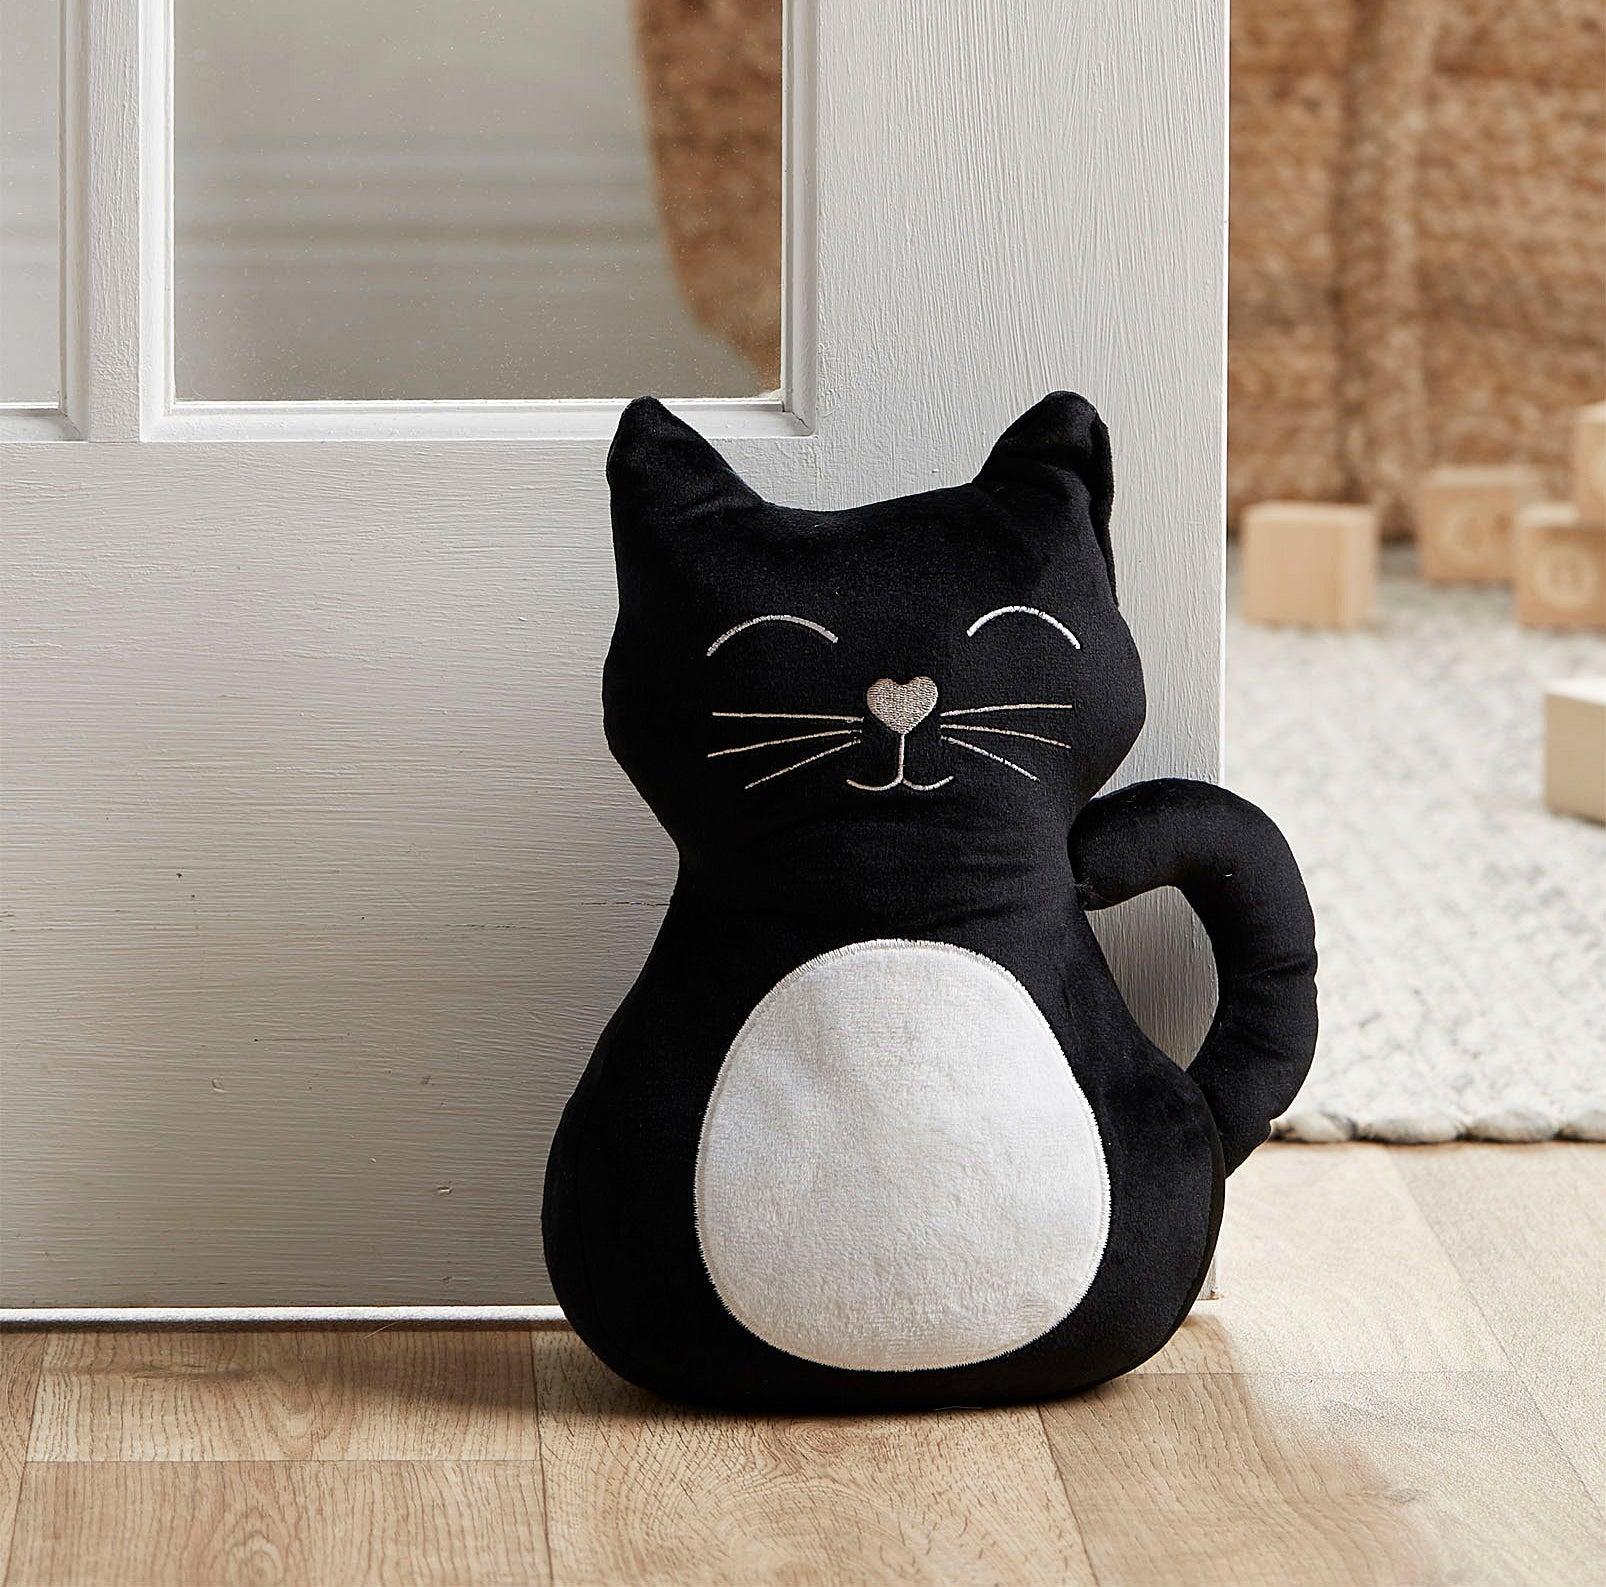 A smiling cat plush doorstopper